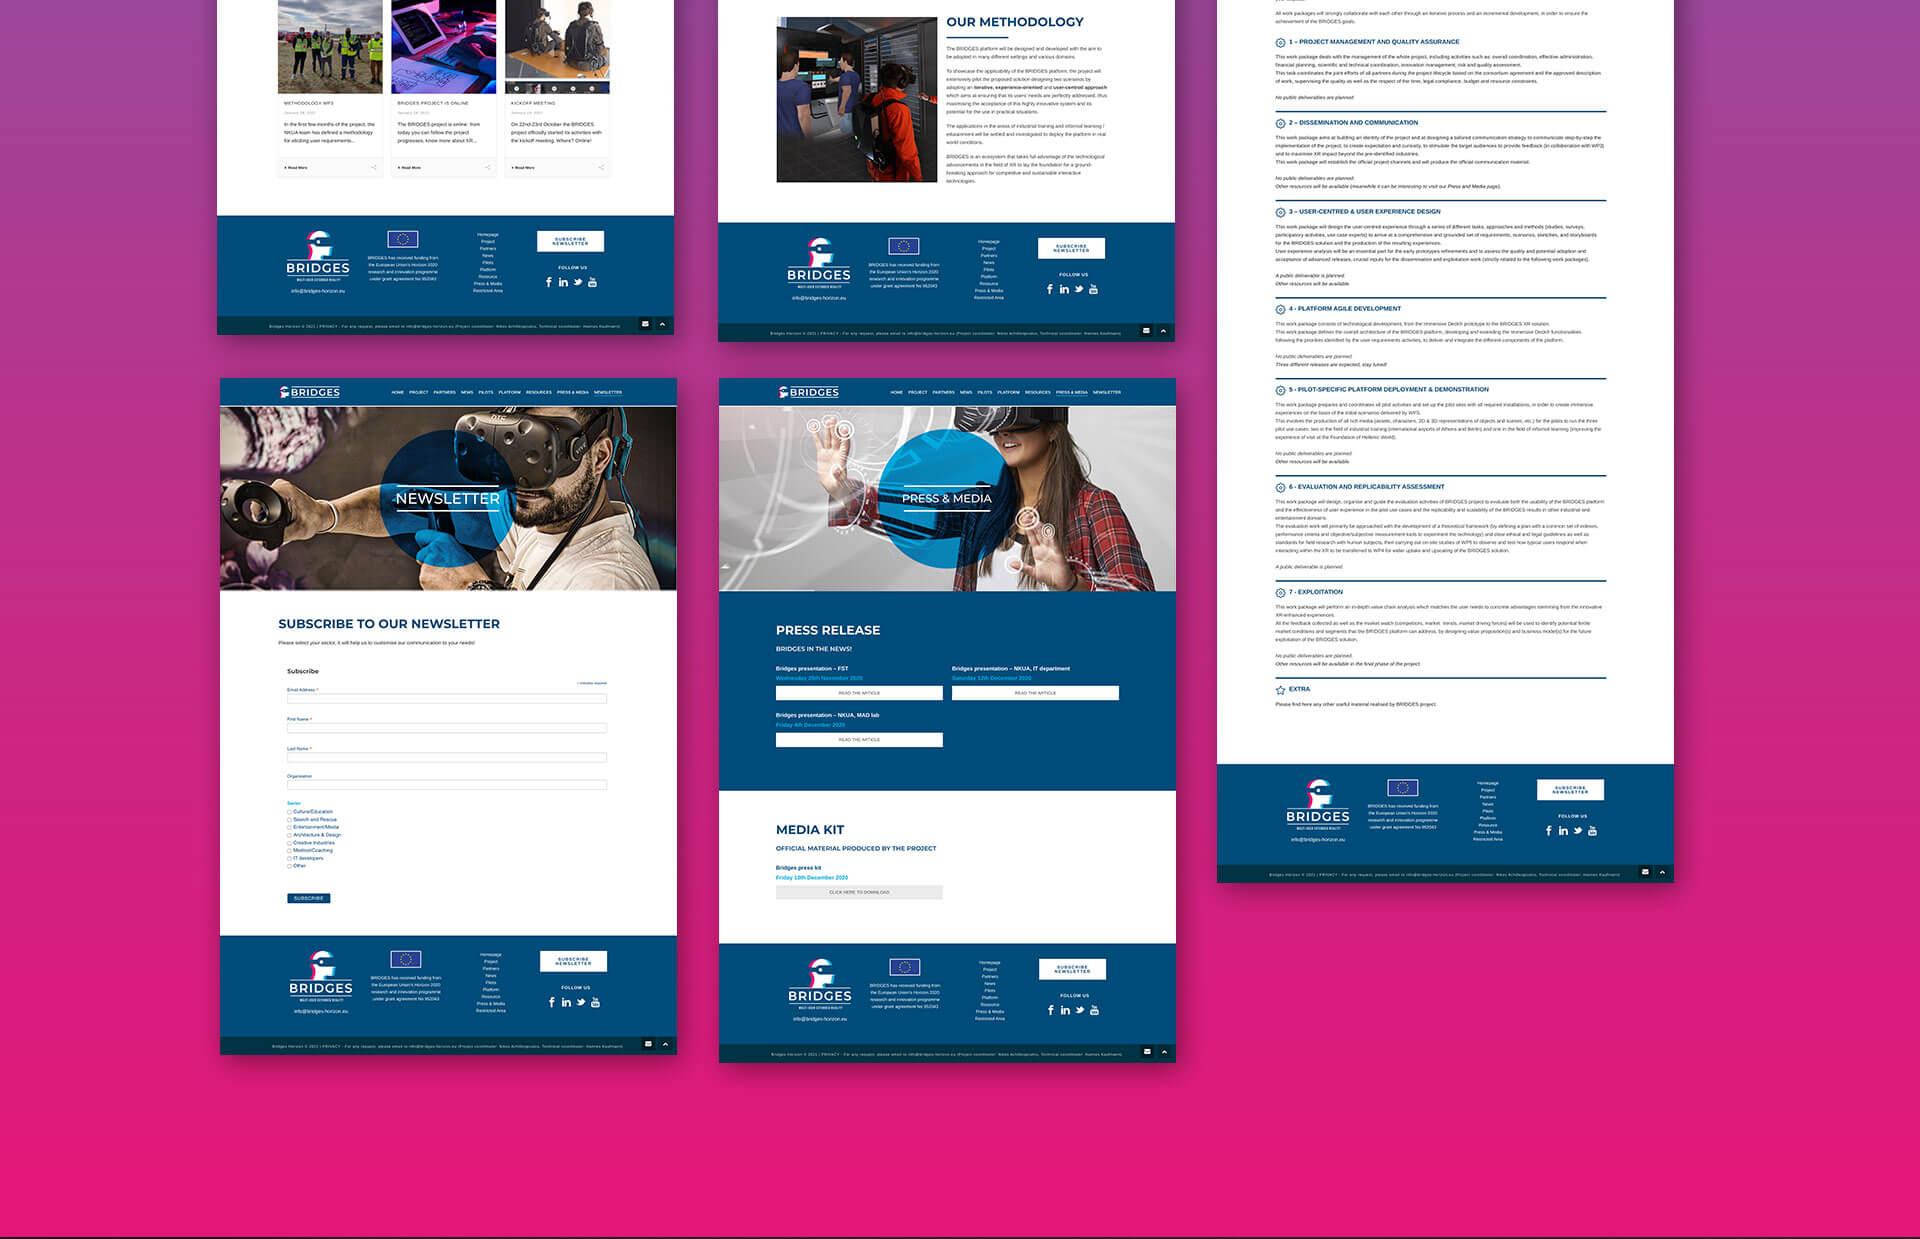 zerouno-design-Bridges-website4